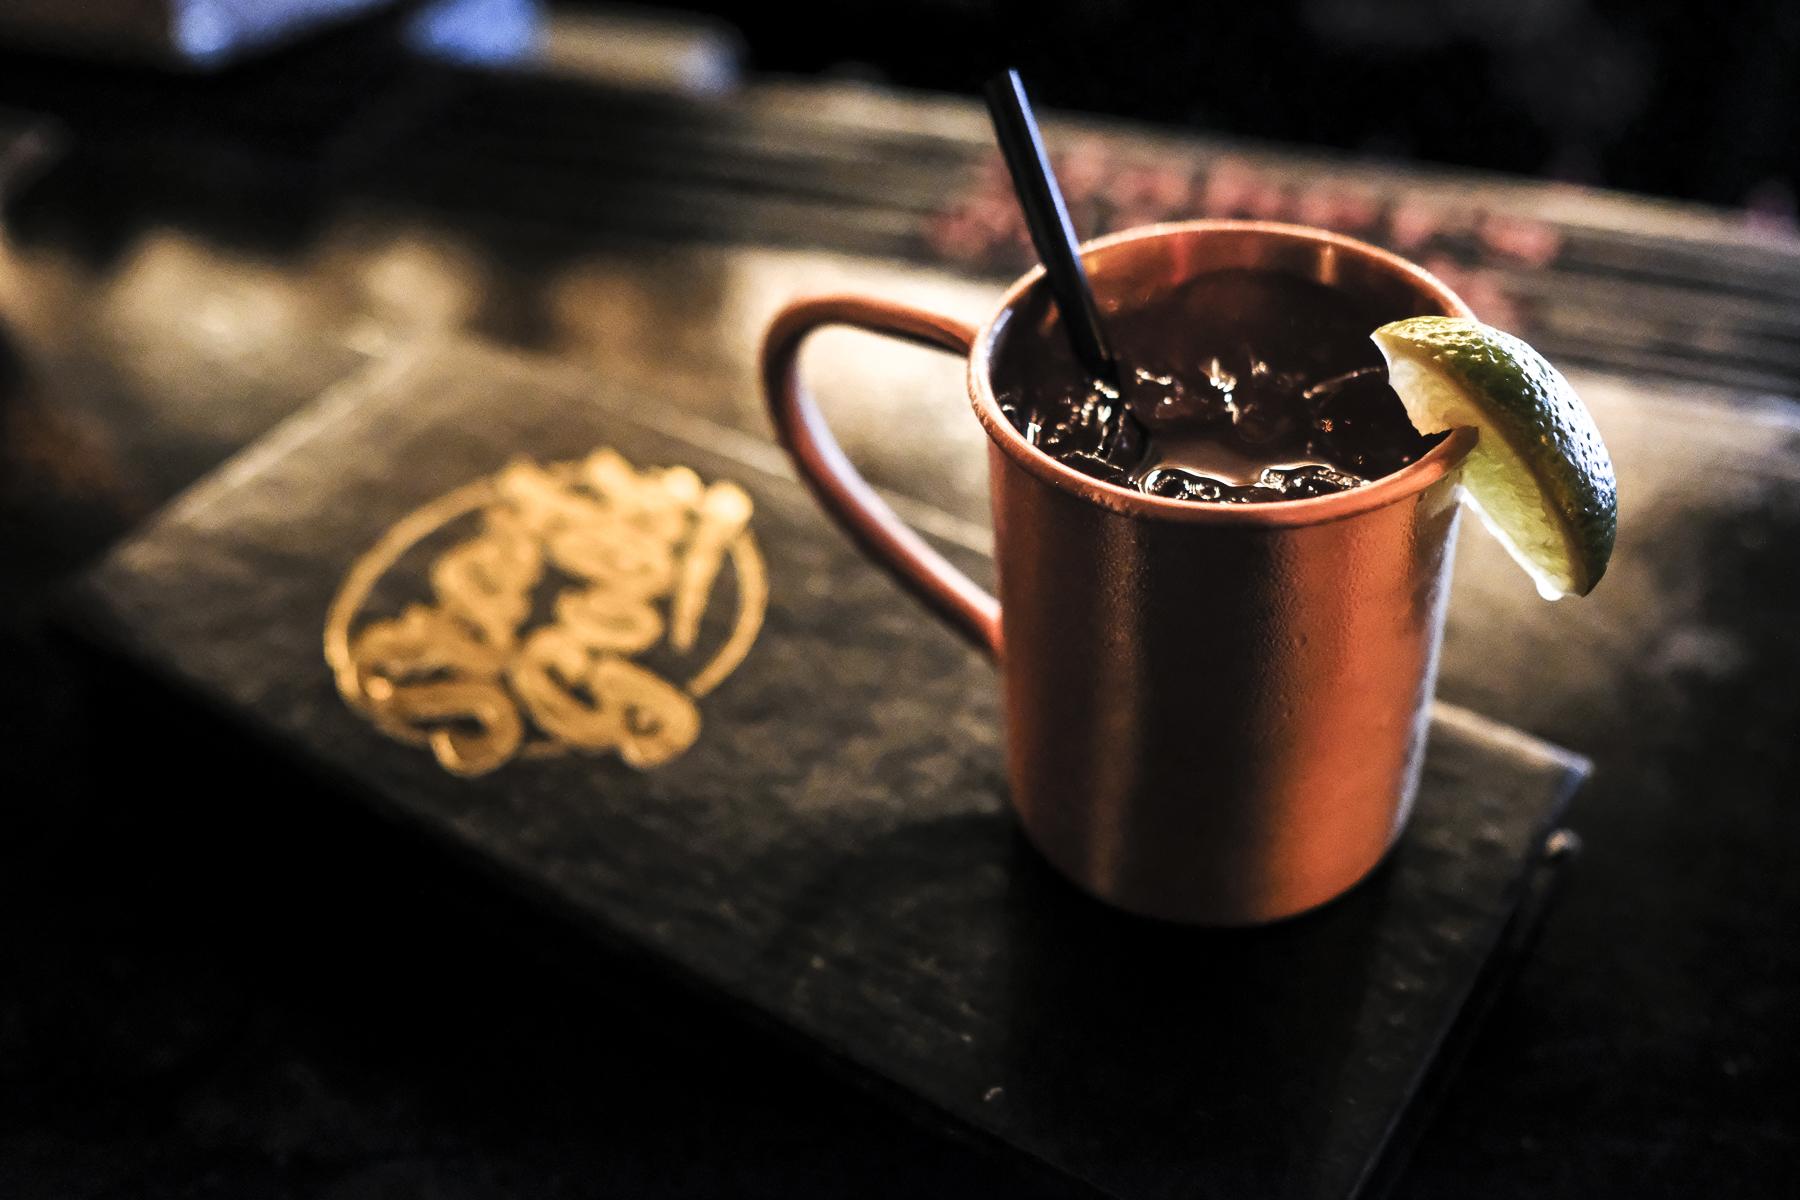 Bailey_Toksoz_Photography_Austin_Texas_Food_Drink_Photographer_Stay_Gold.JPG